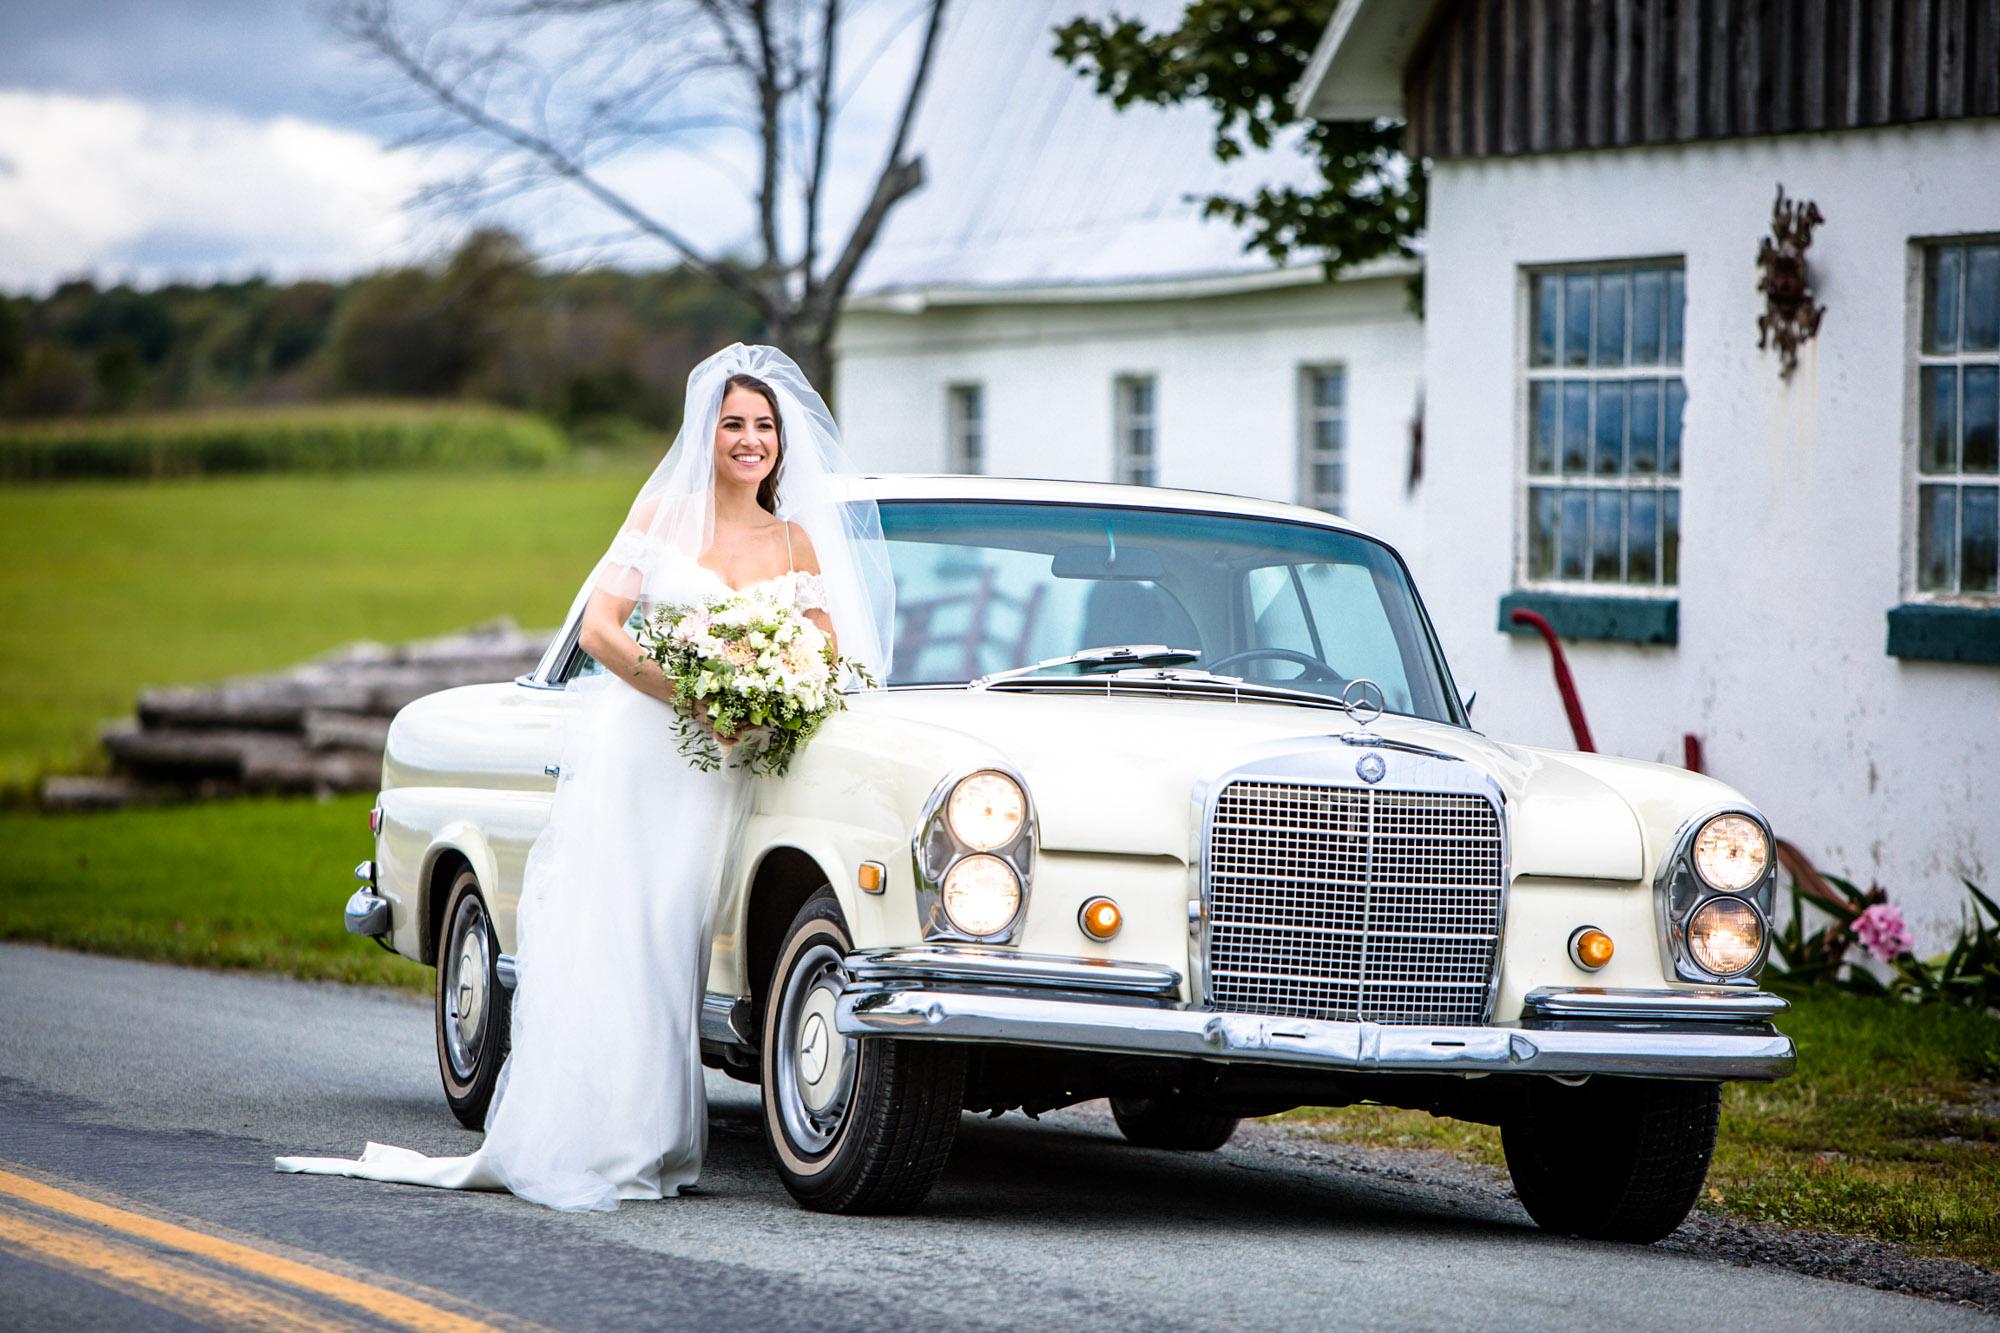 scranton_wedding_photographer_lettieri_pa (20 of 34).jpg